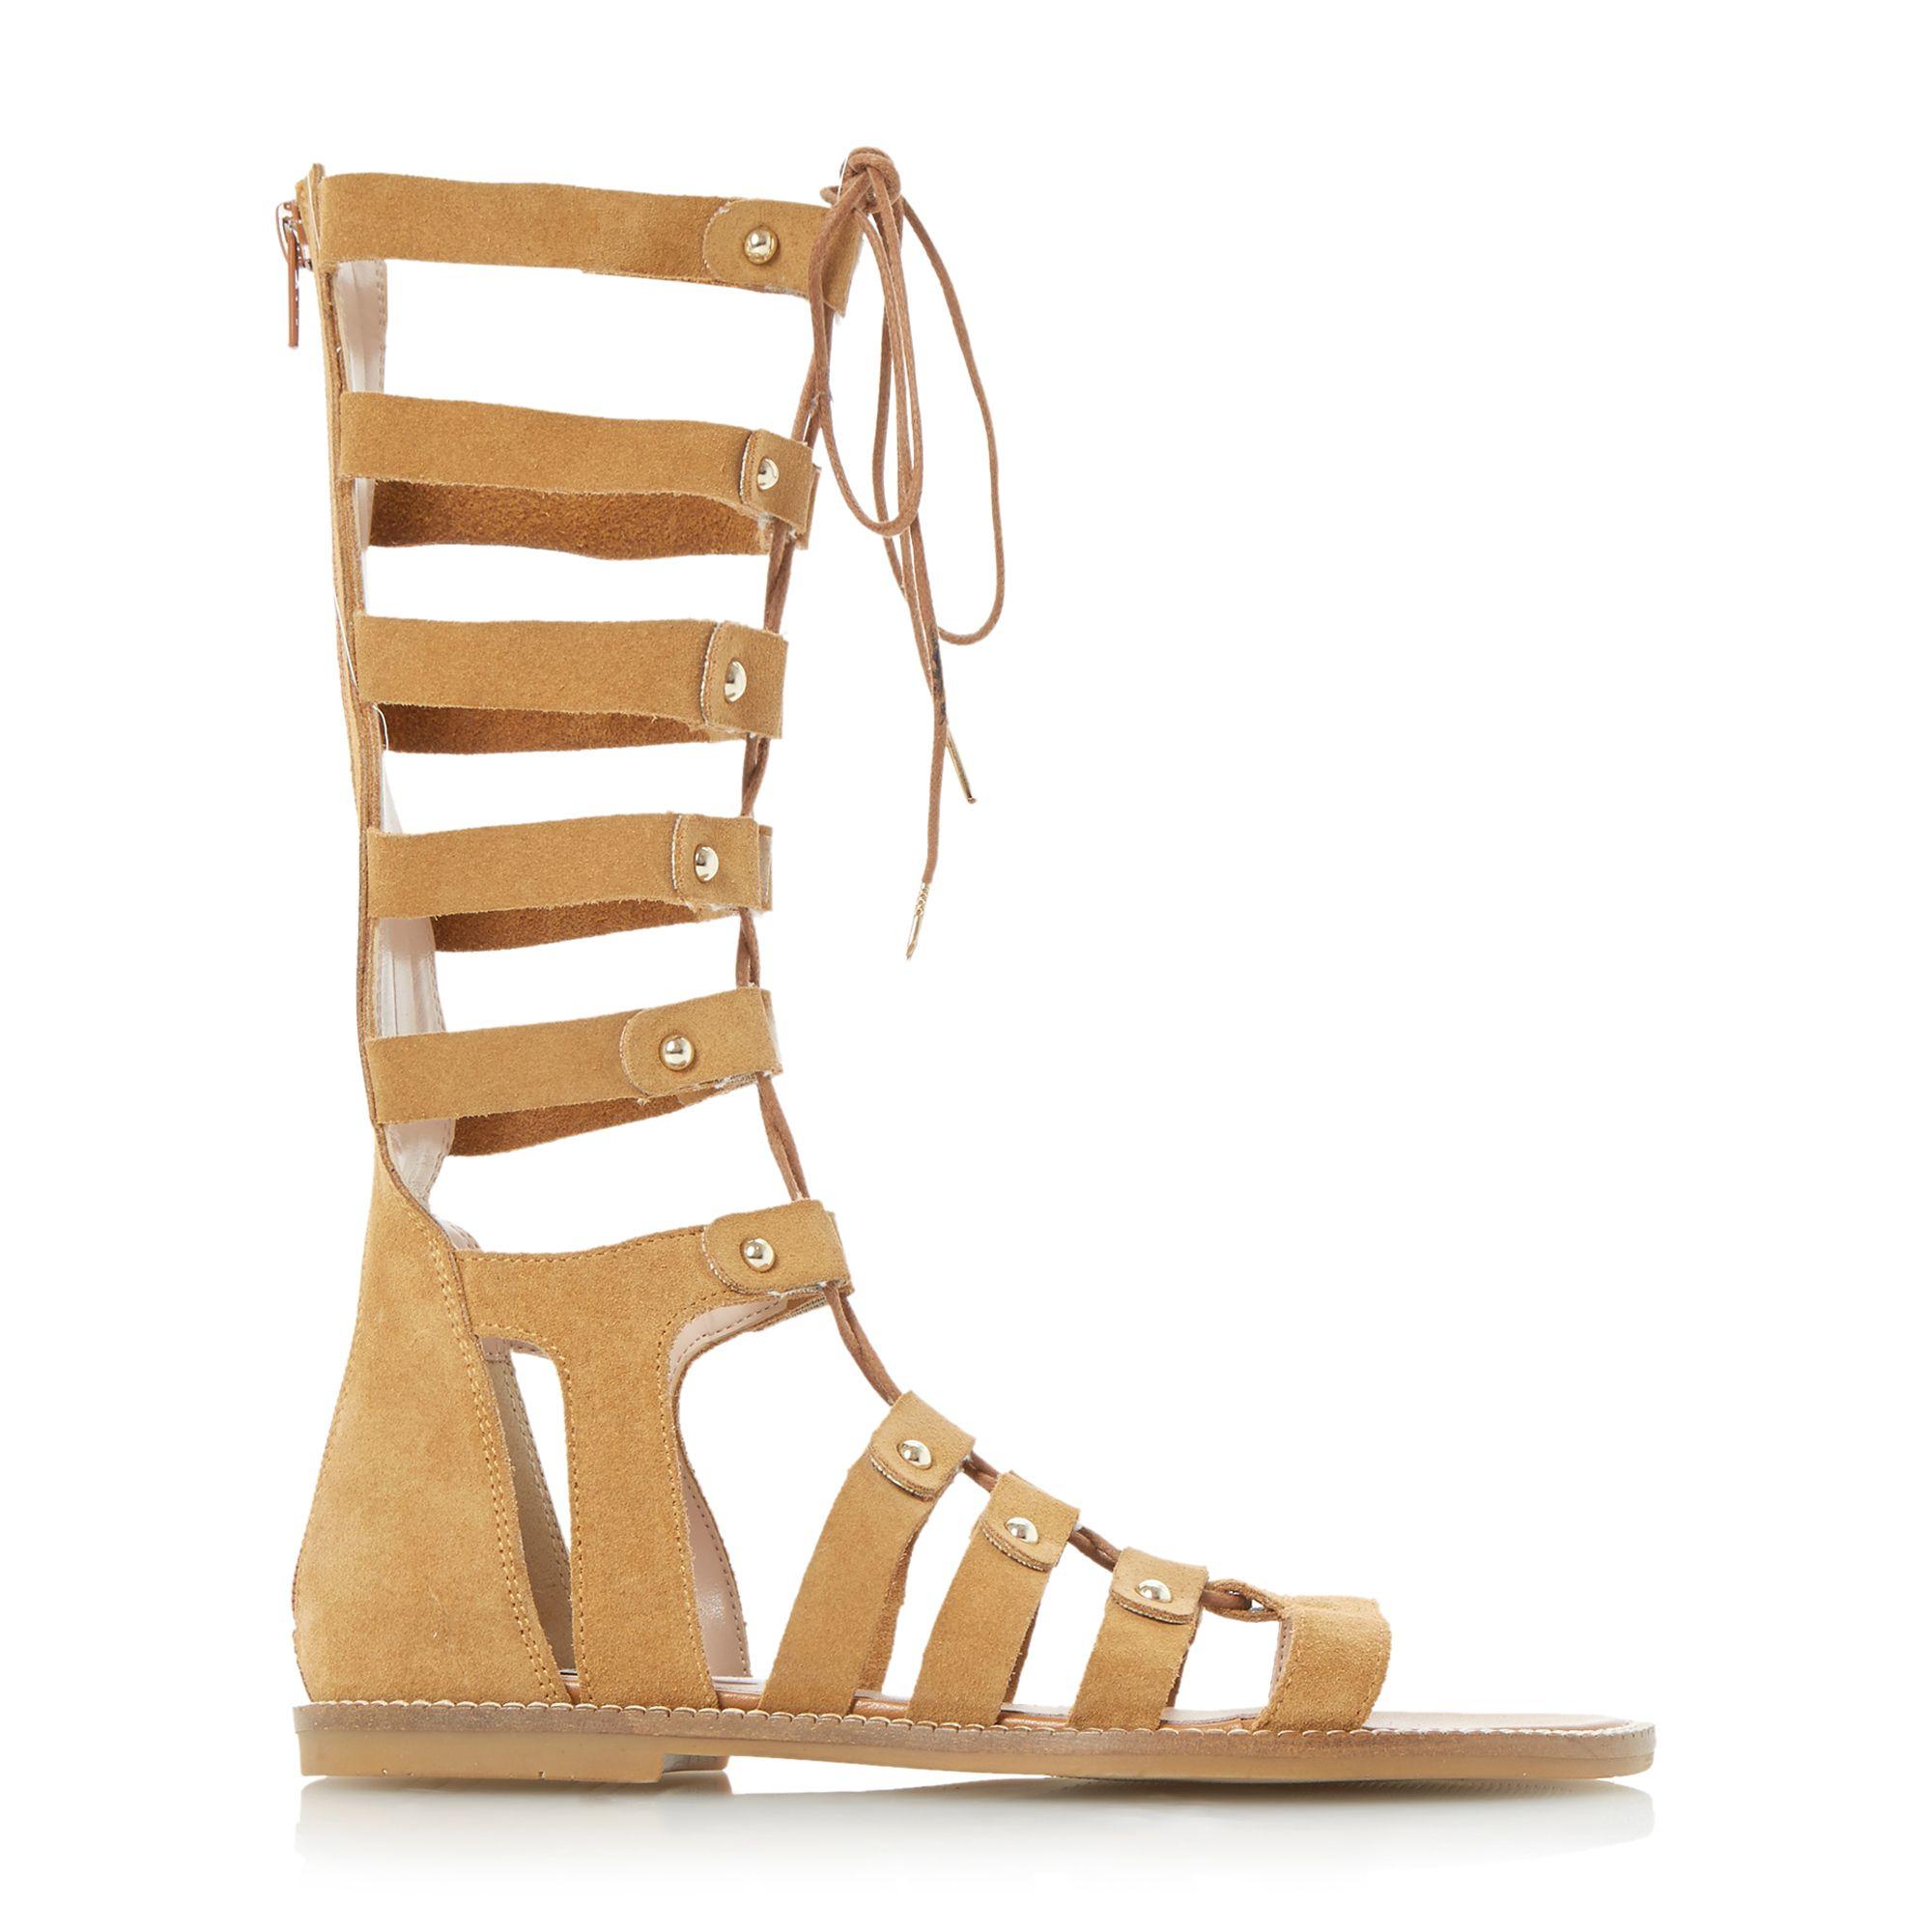 25 Ways Real Girls Wear Gladiator Sandals